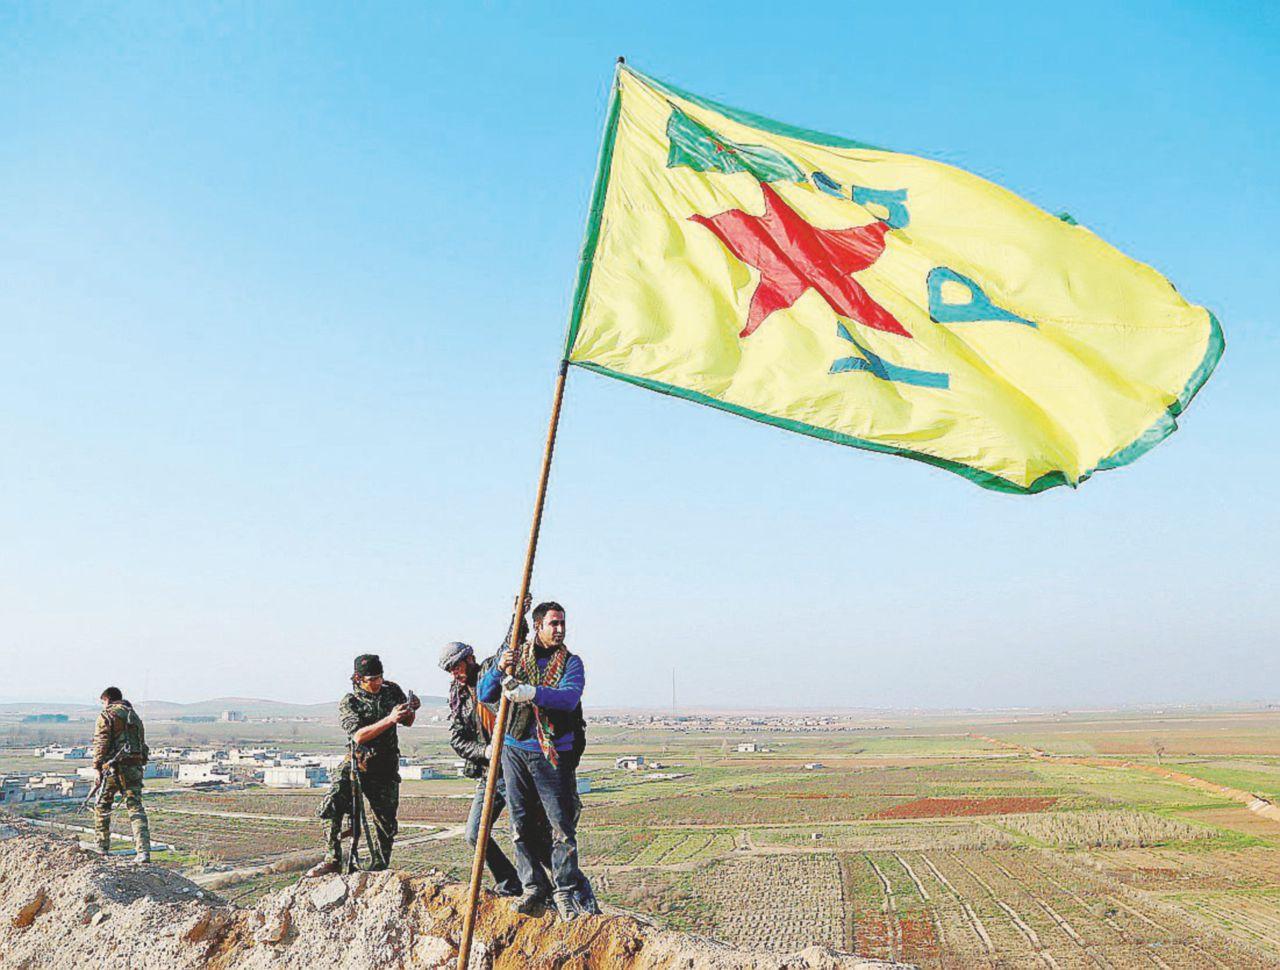 C'era una volta Kobane, ora i turchi vogliono murare i curdi